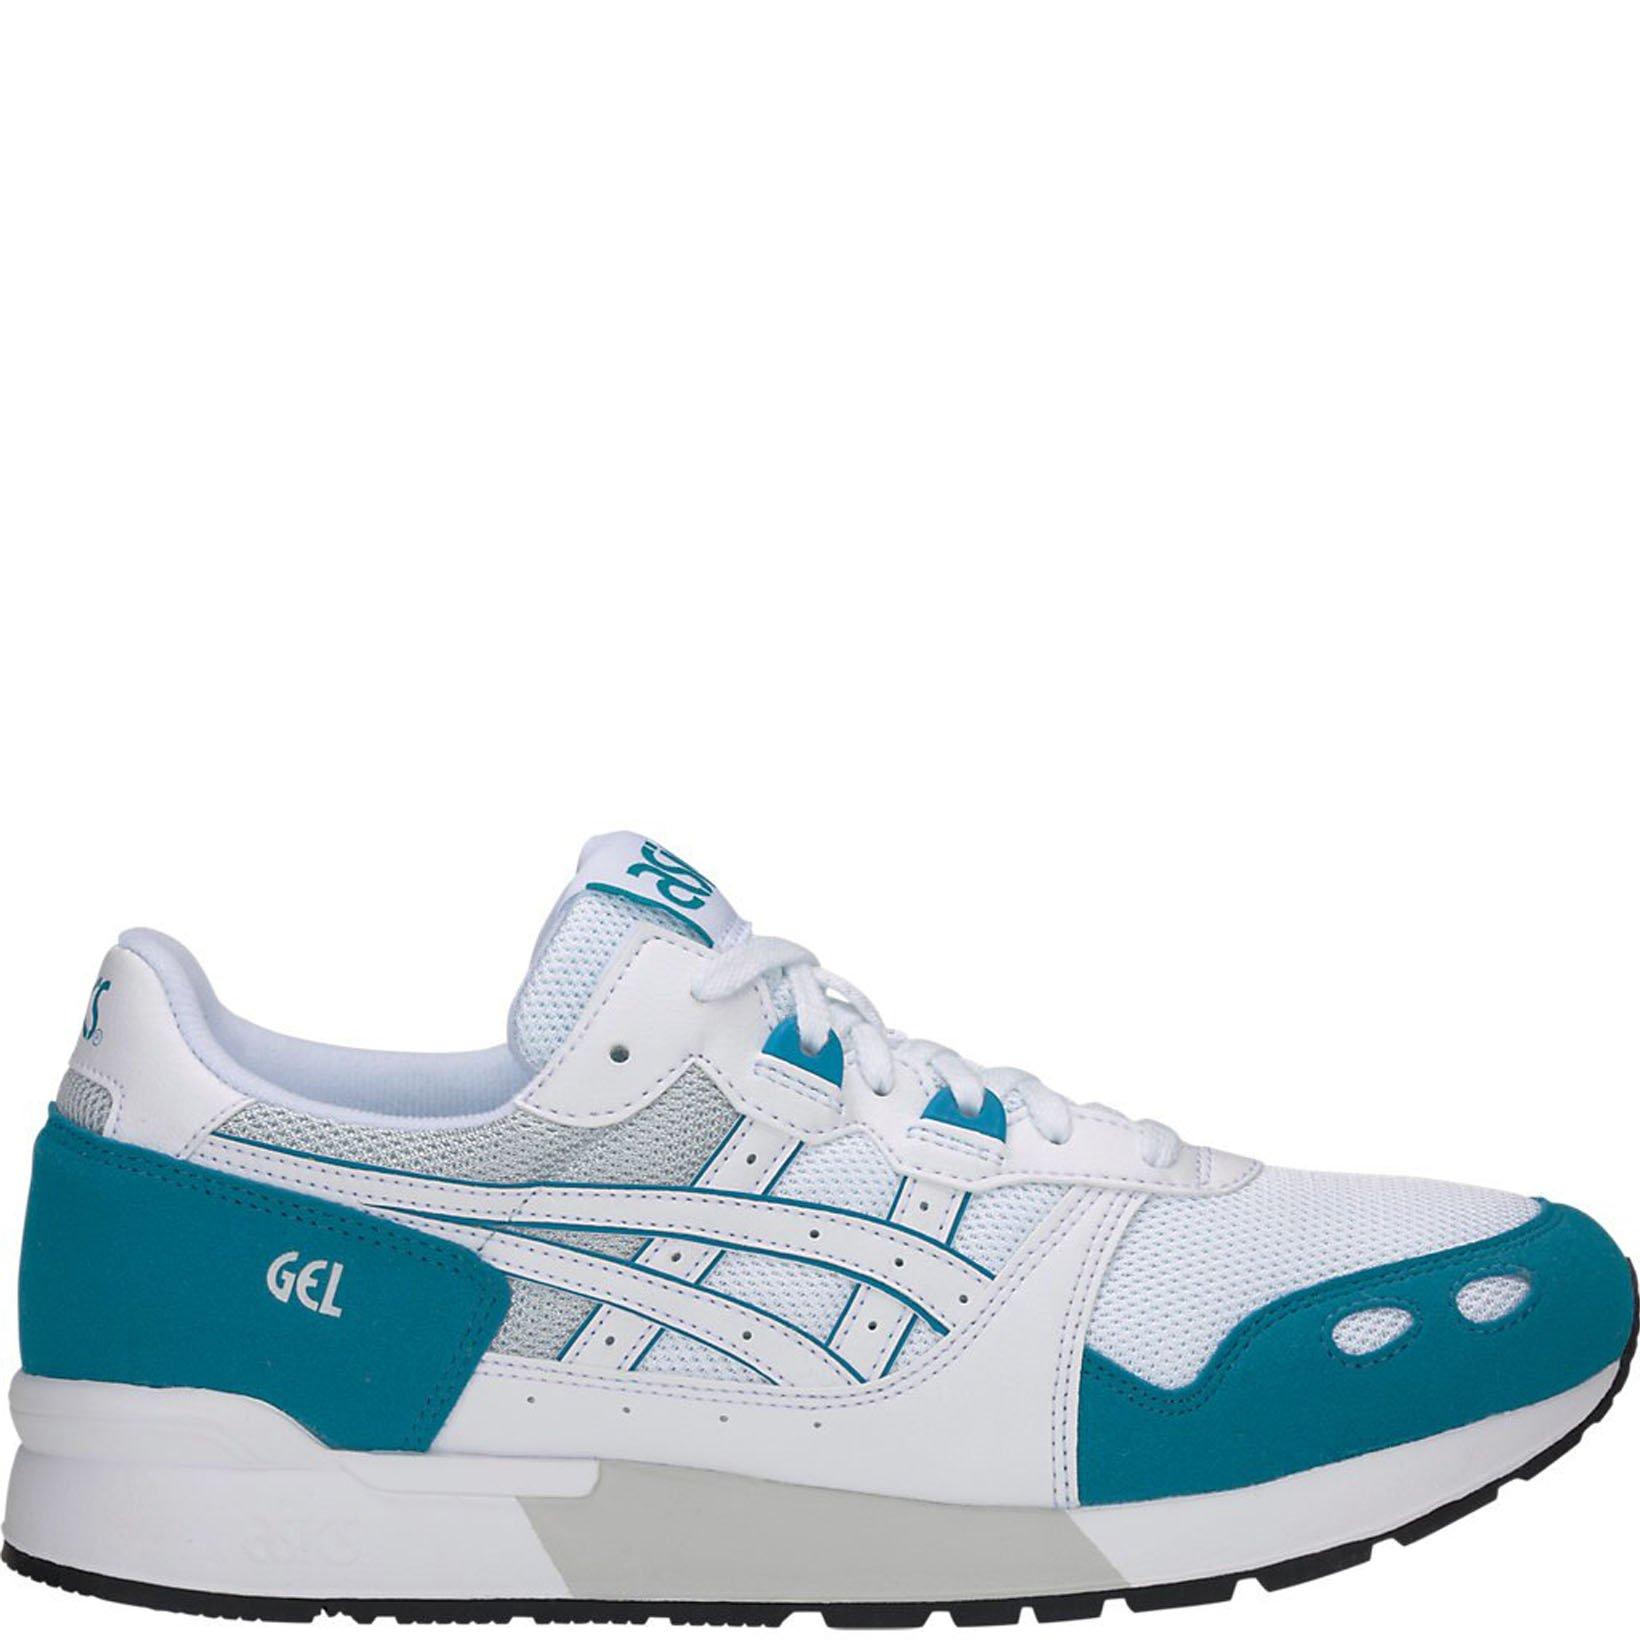 Кроссовки Asics Gel-Lyte, white/blue, 37.5 RU фото